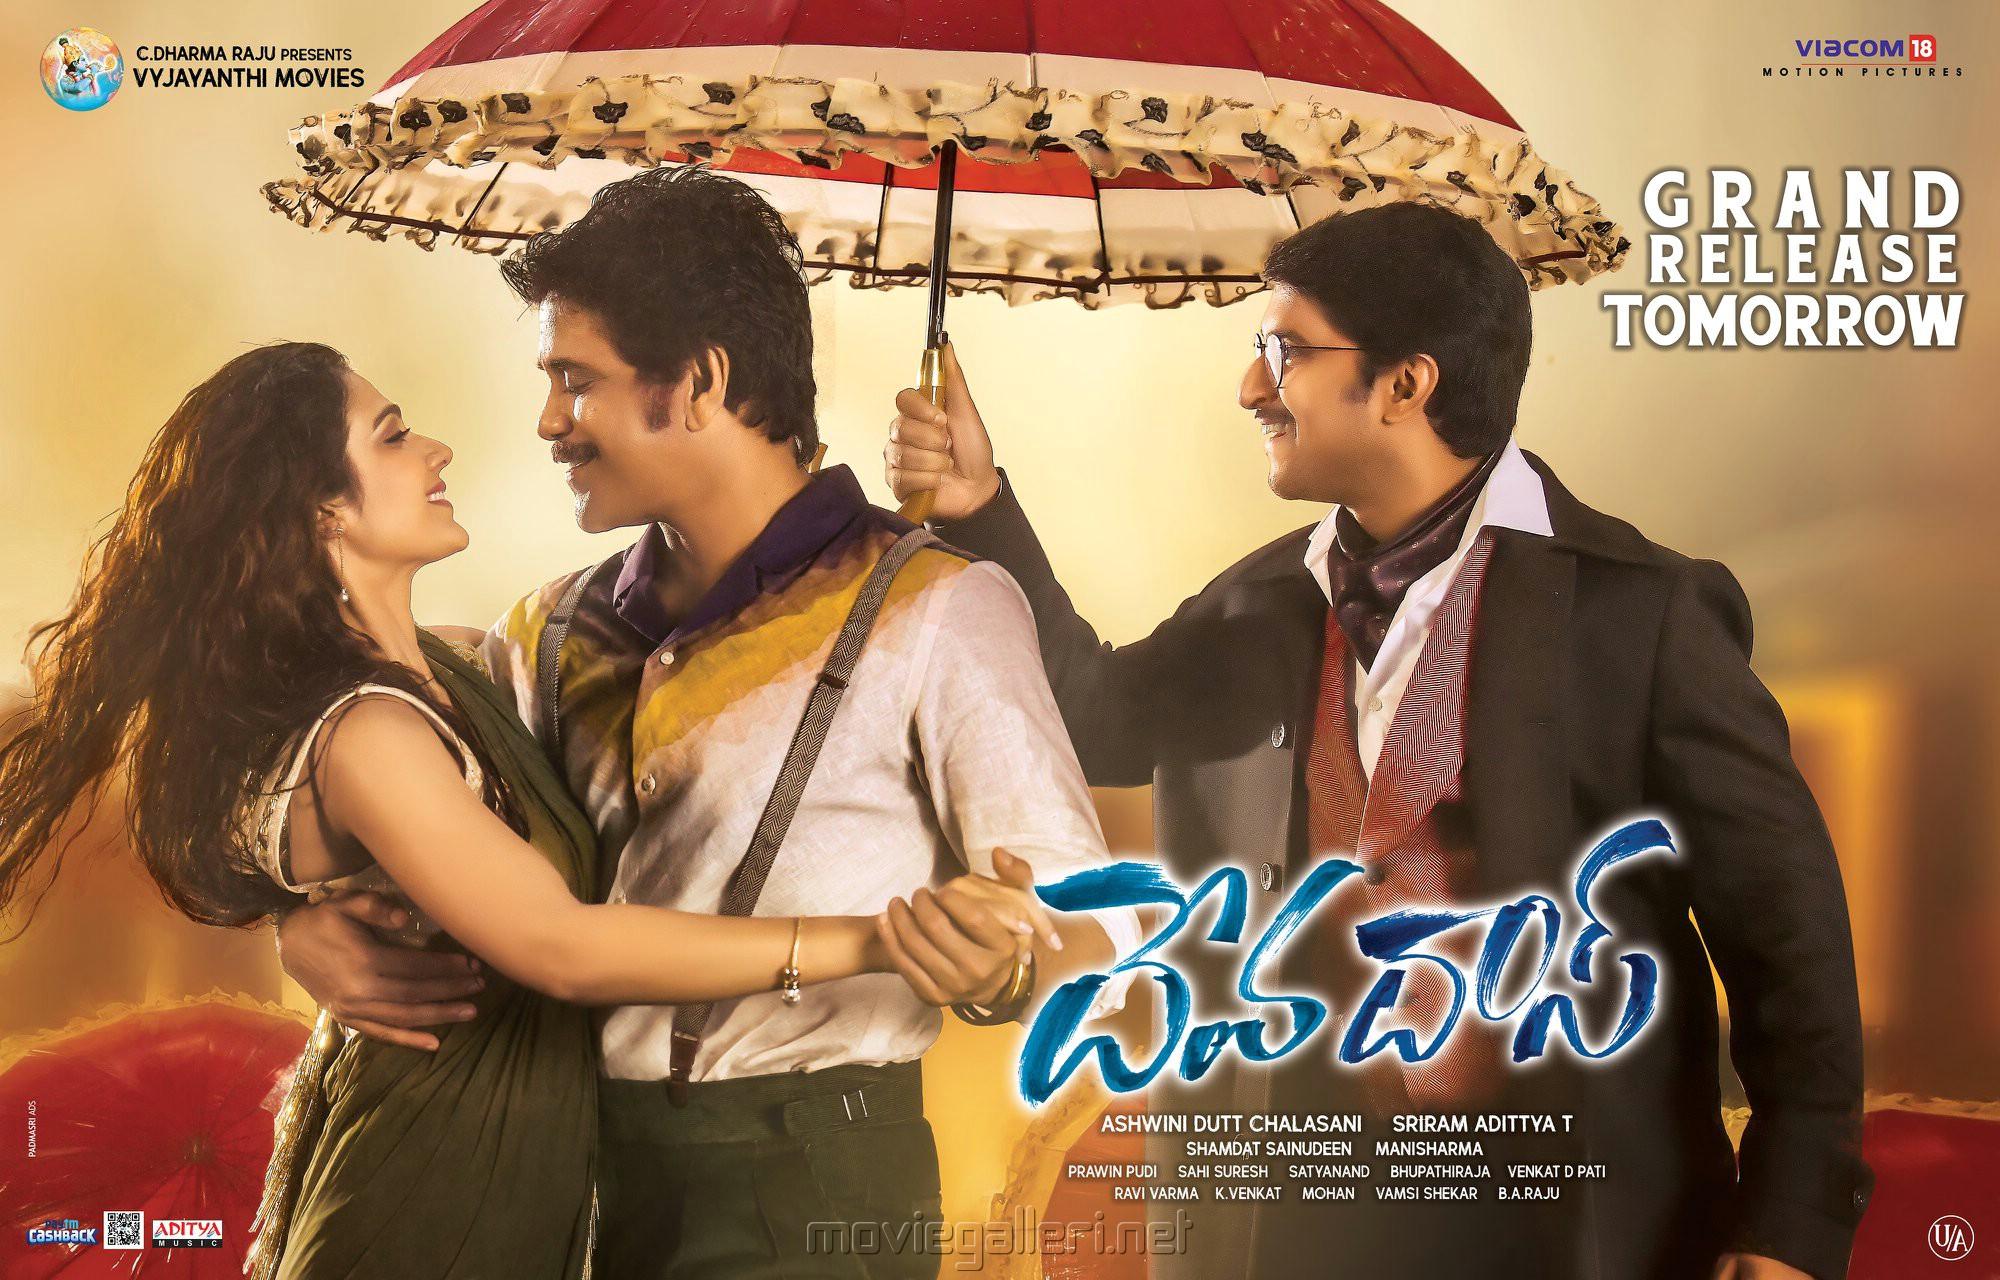 Aakanksha Singh, Nagarjuna, Nani in Devadas Movie Release Tomorrow Posters